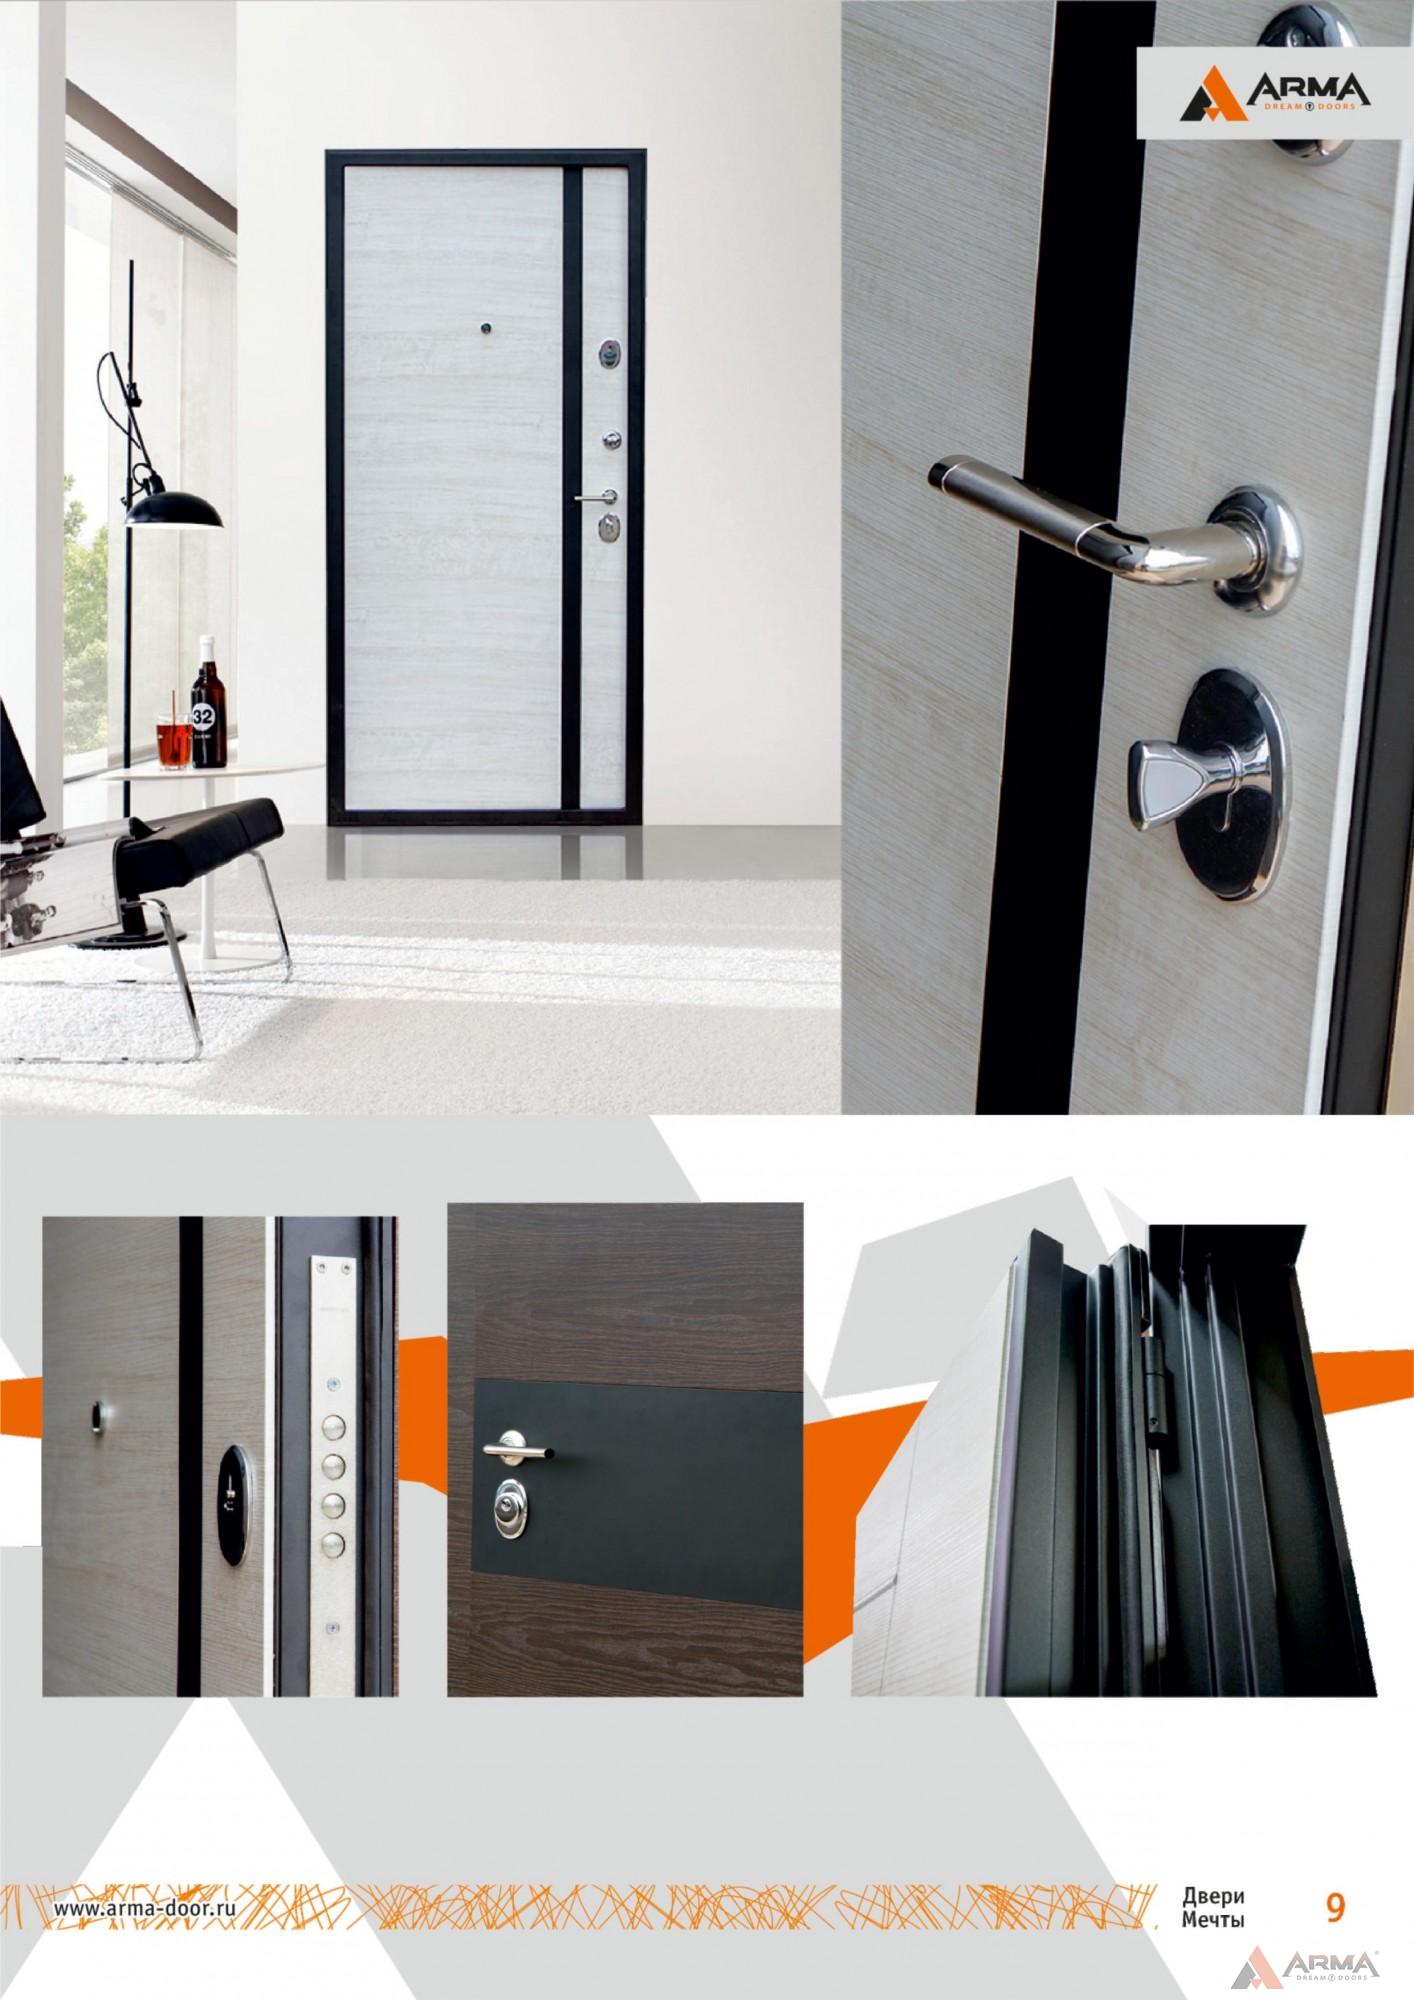 металлические двери со звукоизоляцией от производителя в москве